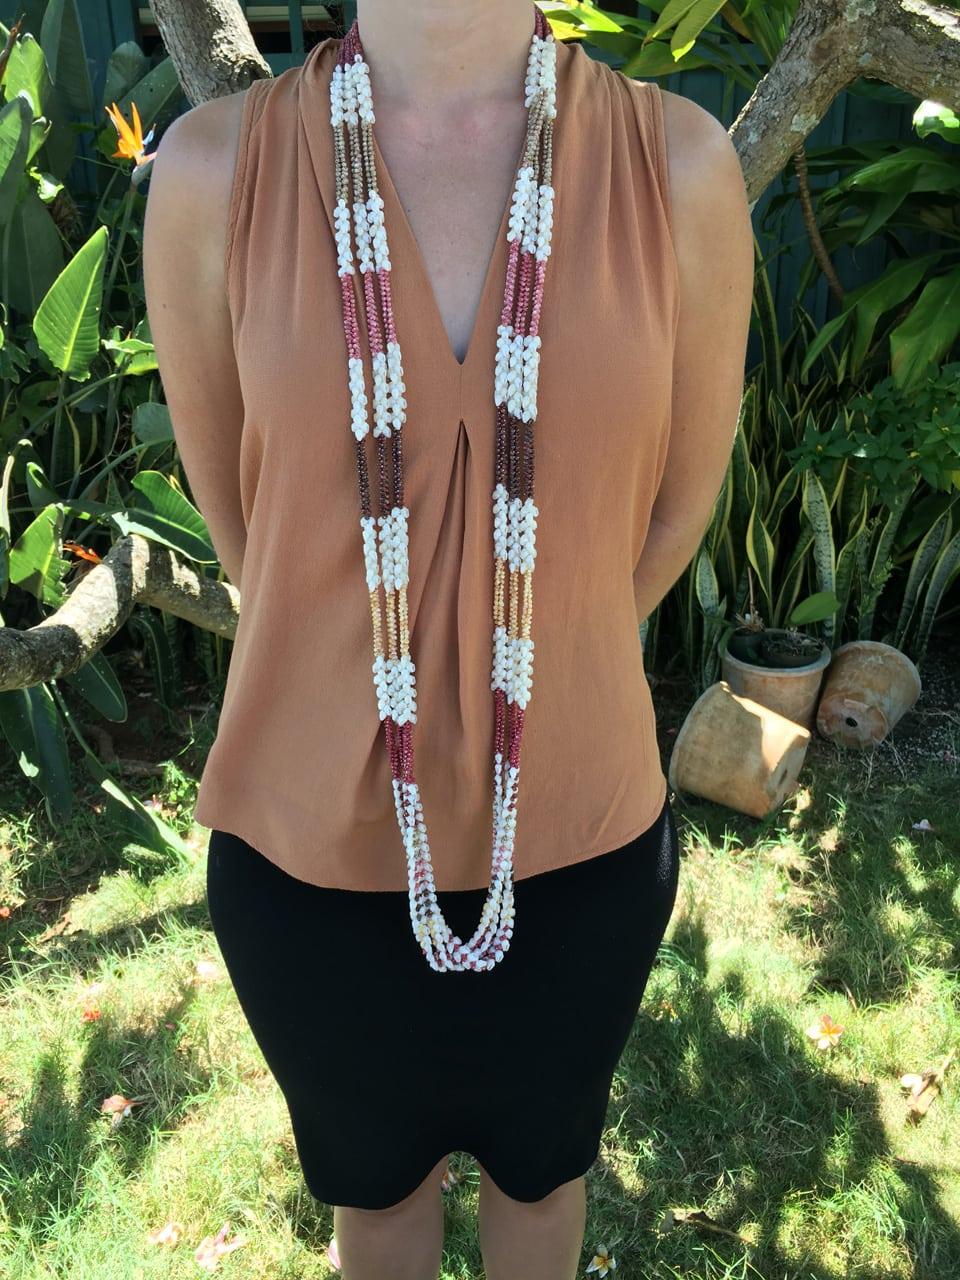 "Niʻihau Collectors' Lei, 55"" 3-Strand Kipona Heleconia/Pikake/Mauna Loa. Crafted by master artisan Kalei Beniamina."